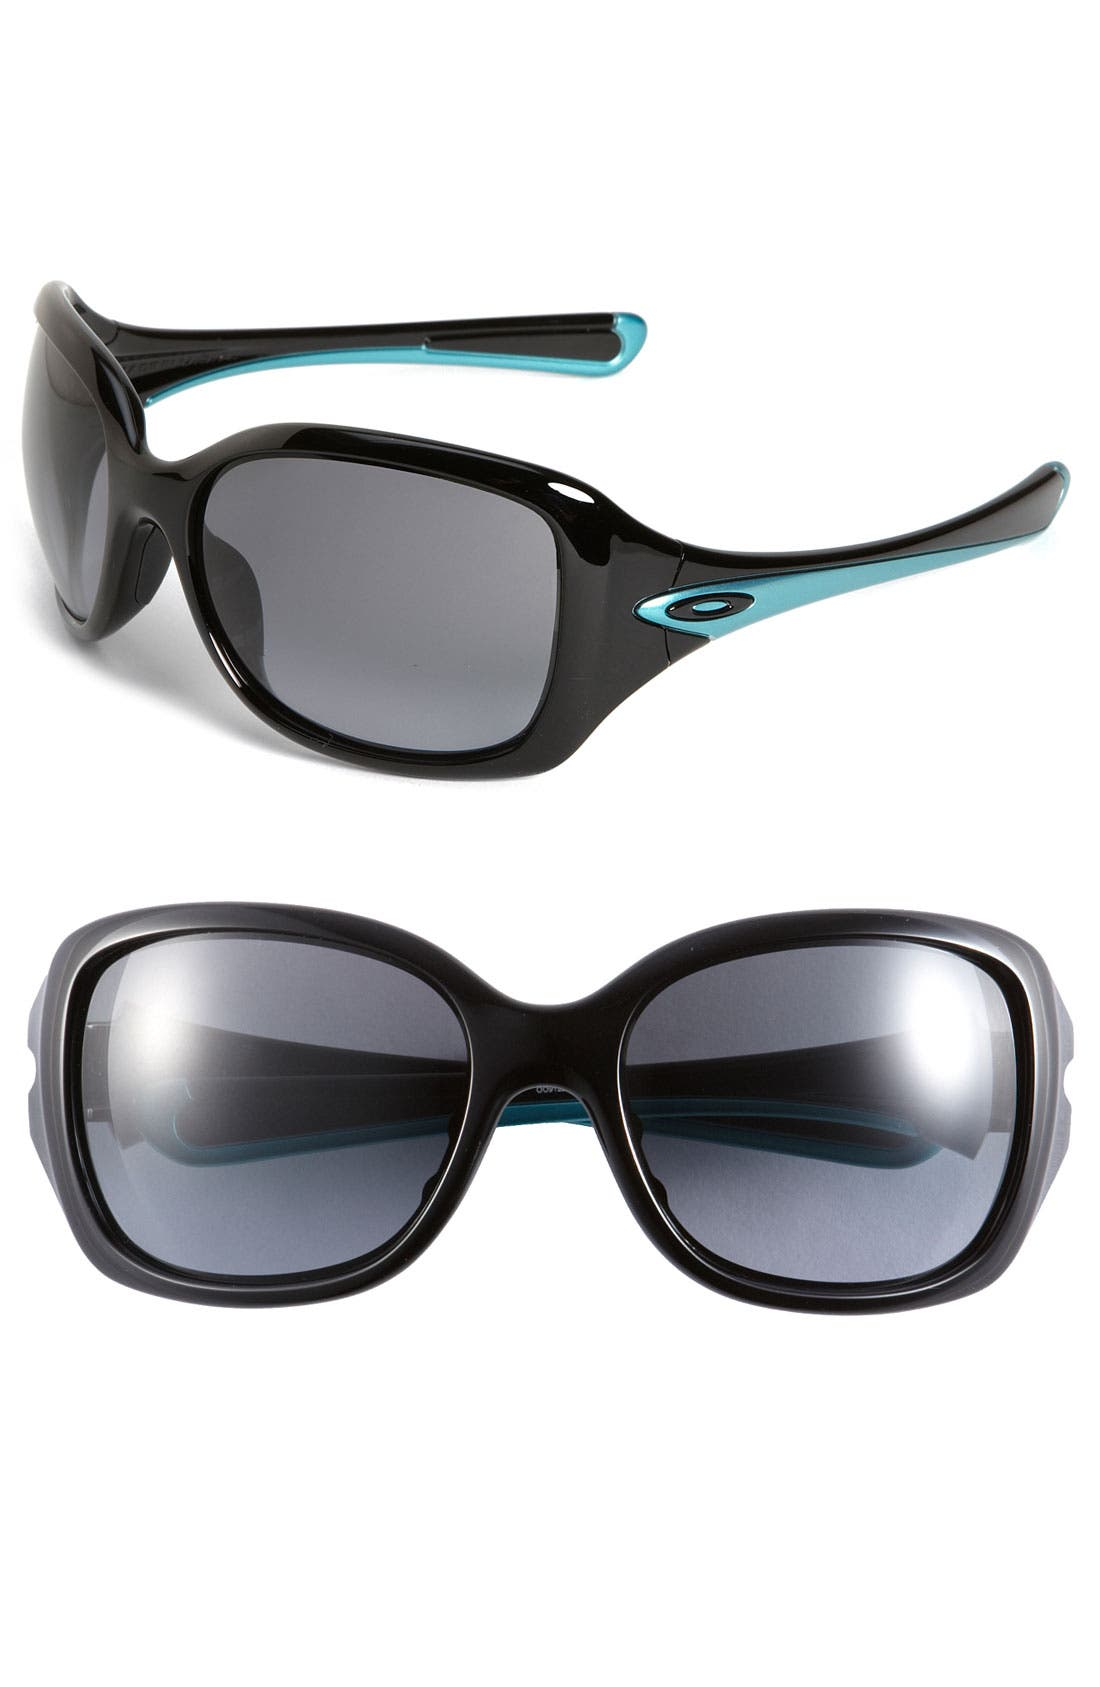 Main Image - Oakley 'Necessity™' Sunglasses